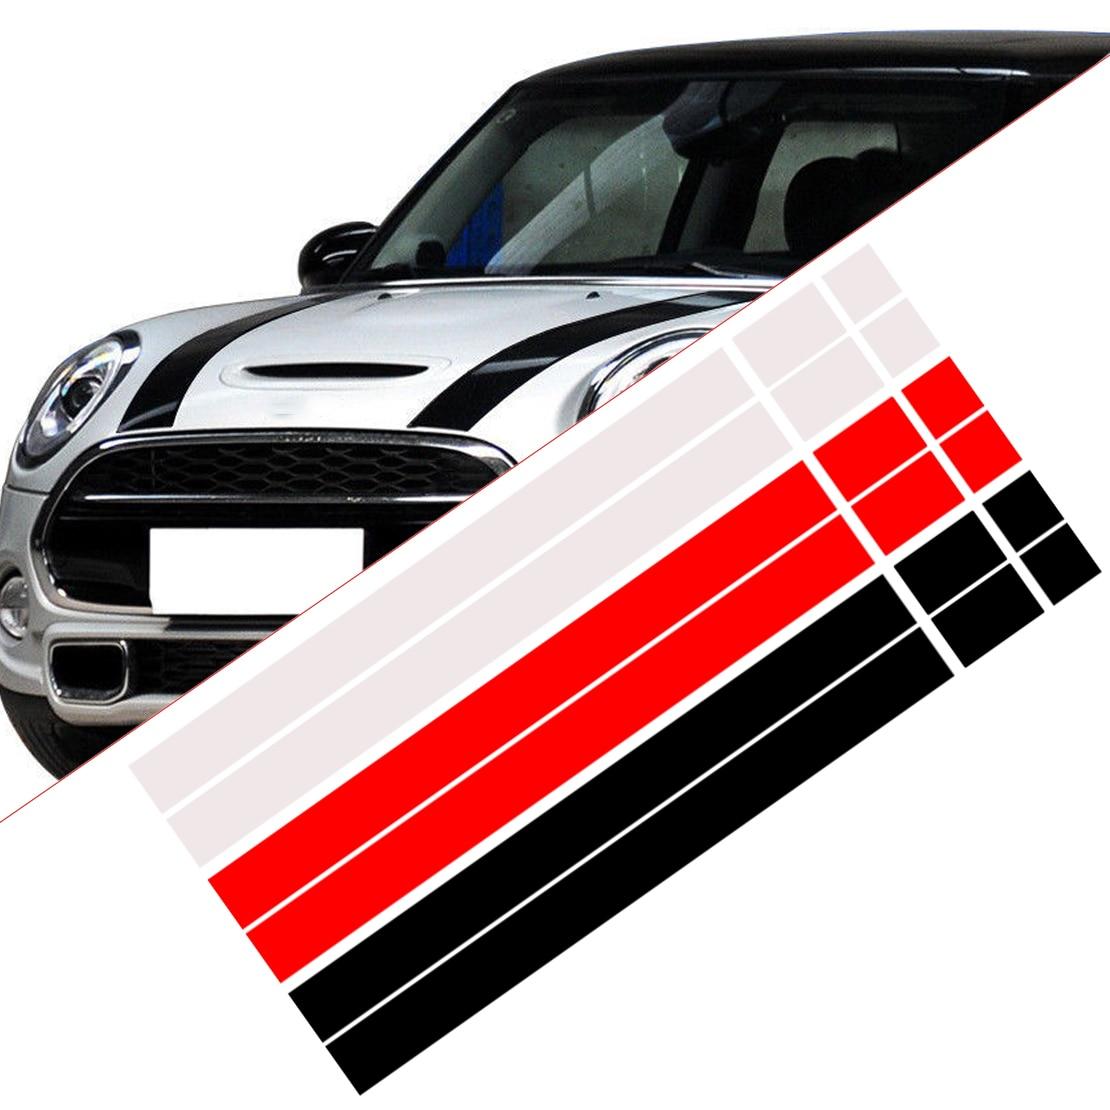 Beler 2 uds vinilo Bonnet rayas Hood pegatina calcomanía apta para MINI Cooper R50 R53 R56 R55 dWm2754536 negro/blanco/rojo